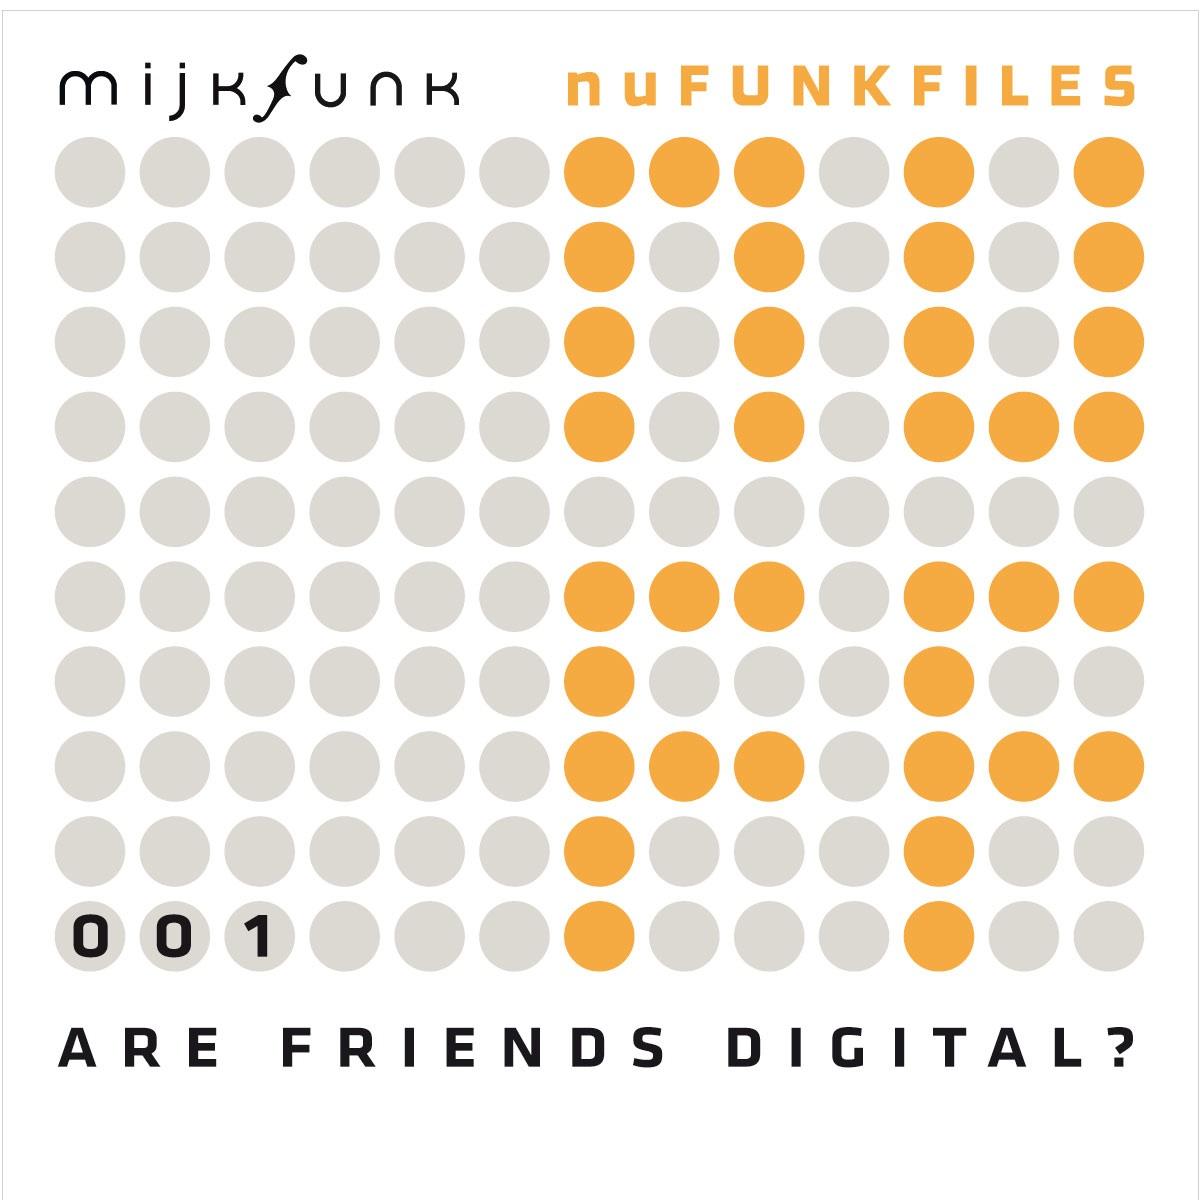 mijkfunk – Are Friends Digital? EP – nuFunkFiles 001